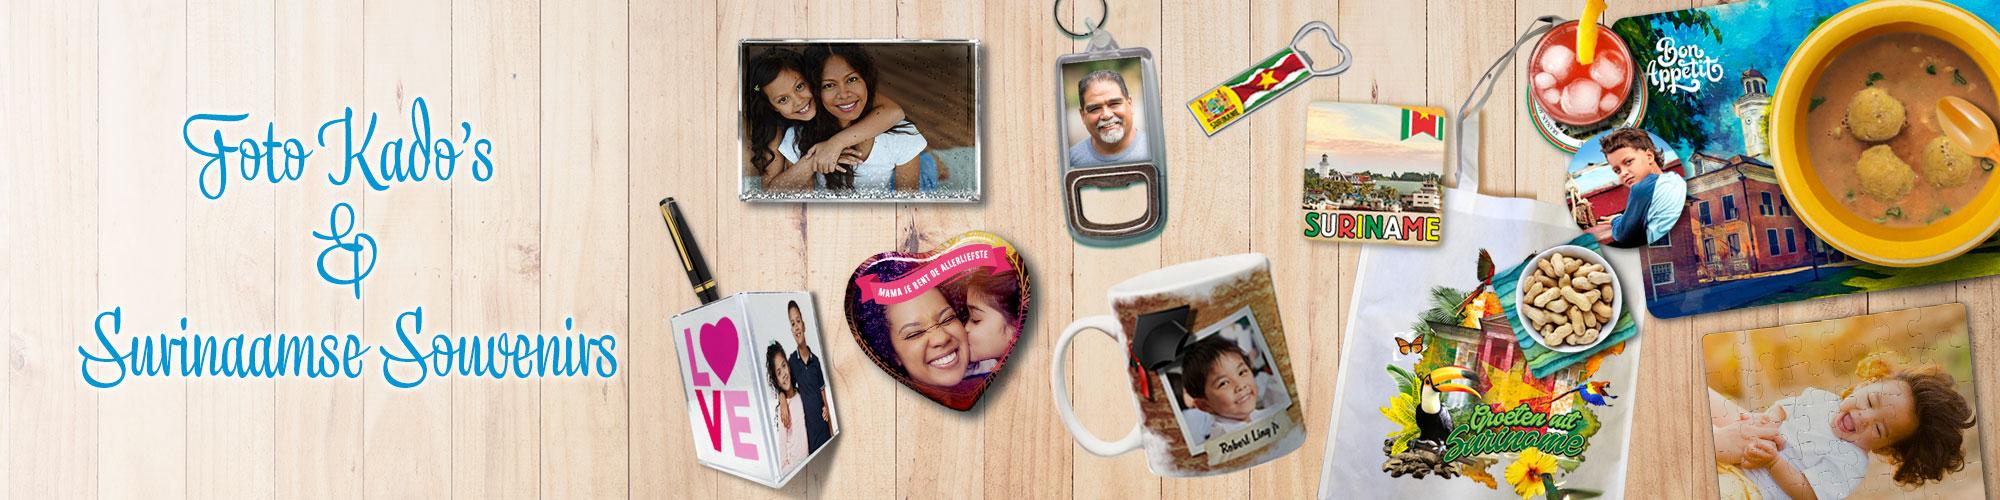 banner-website_gifts